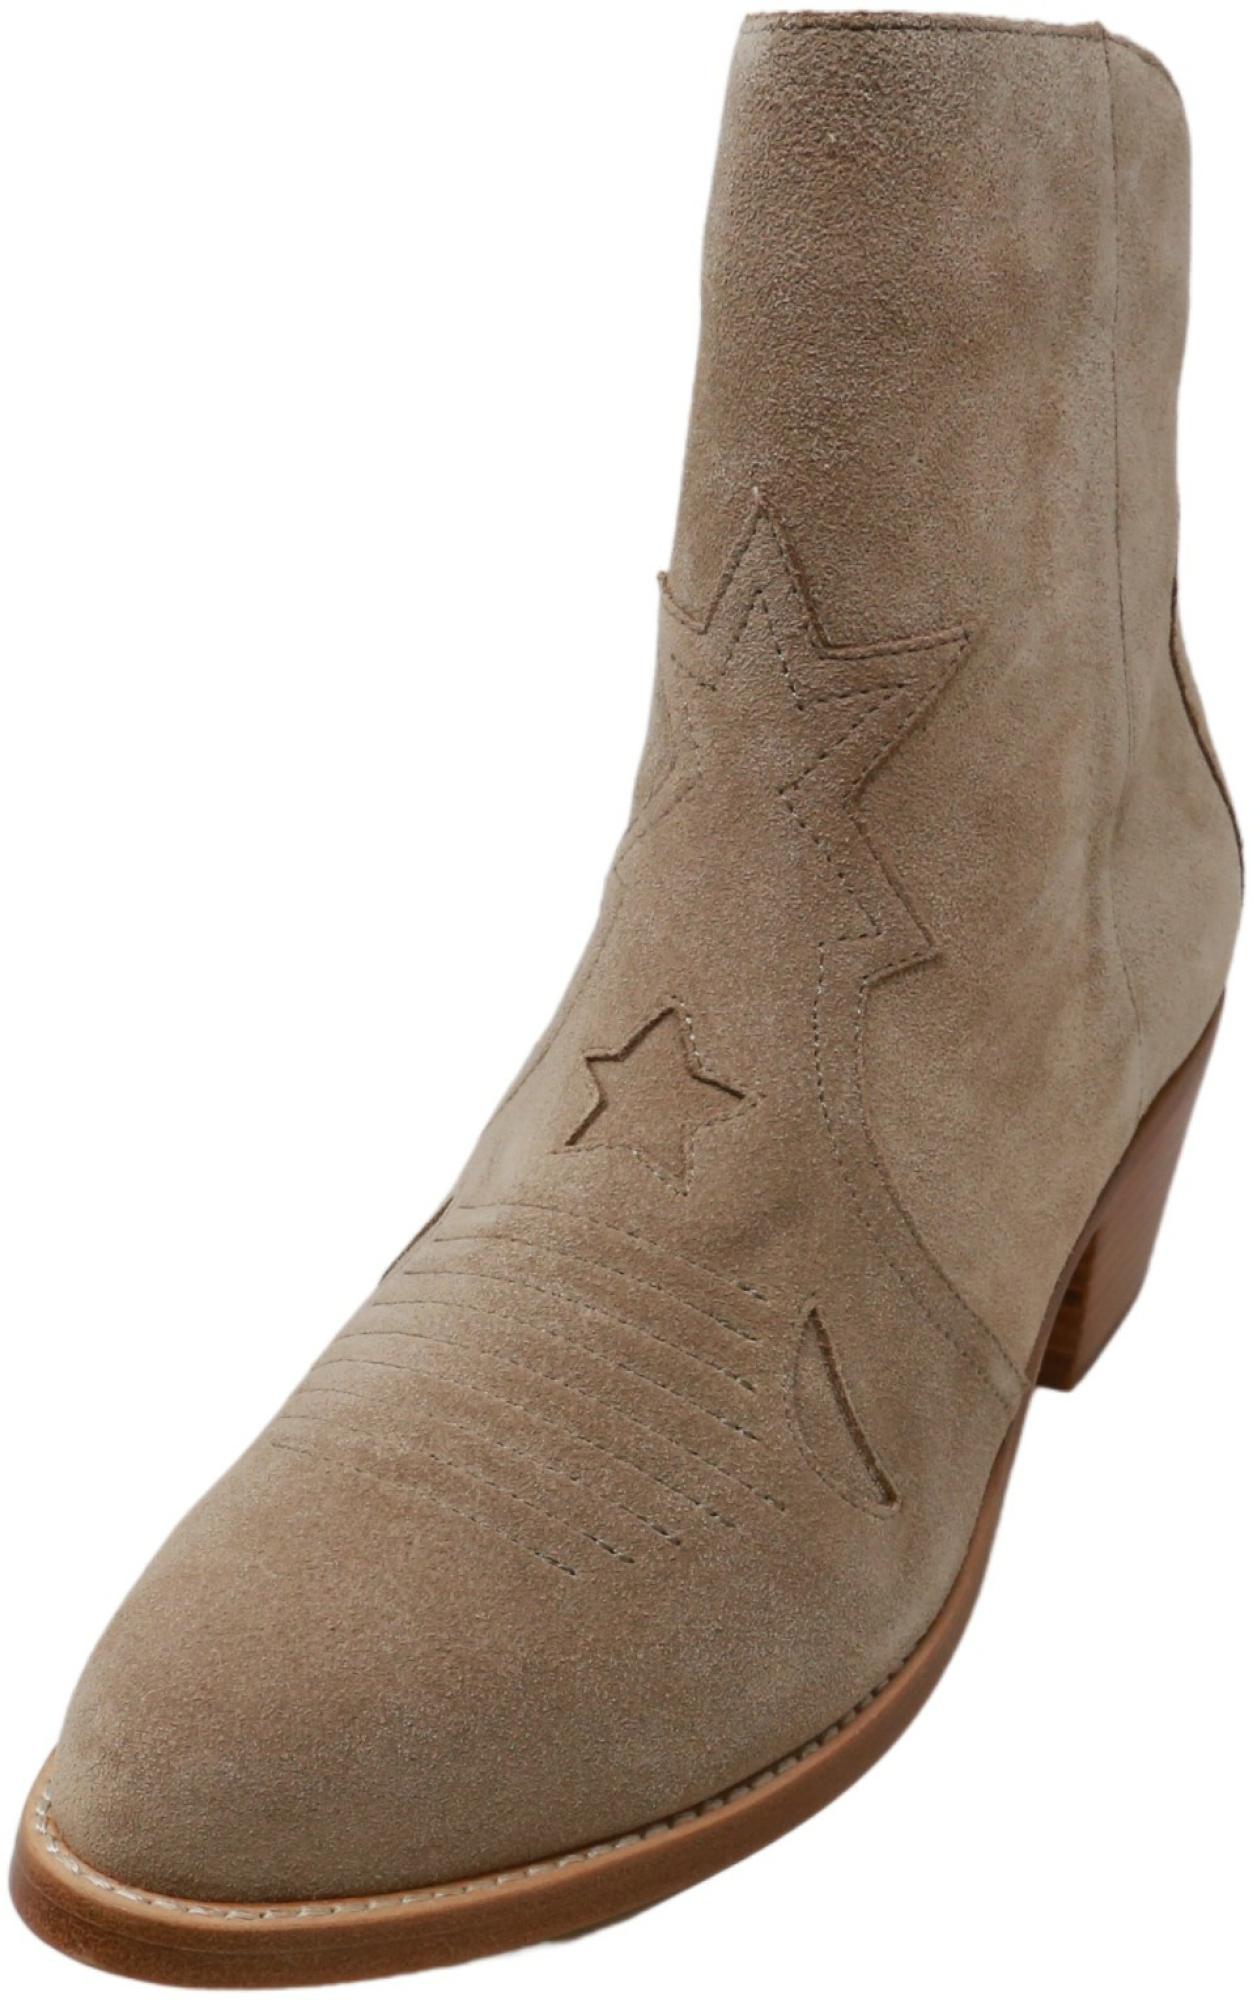 Joie Women's Perpetua Fog Mid-Calf Leather Boot - 10M